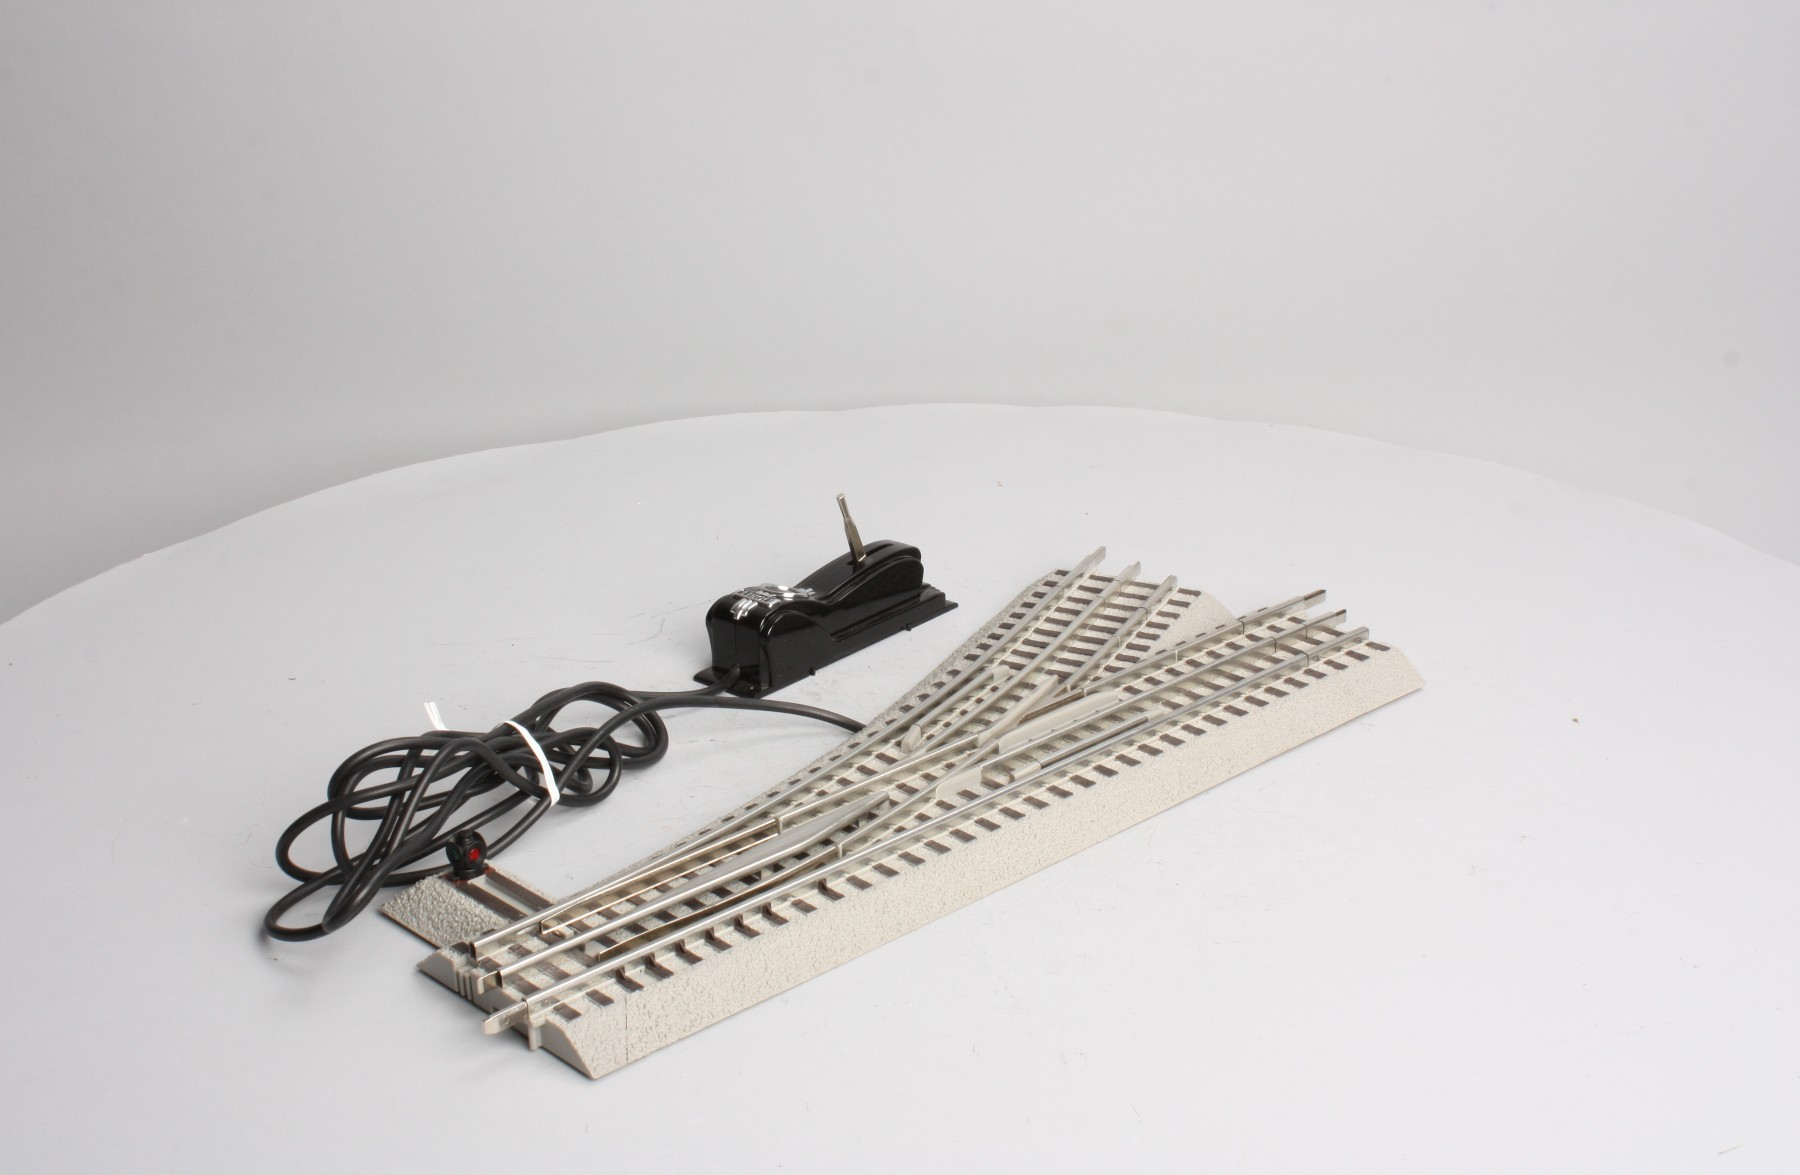 Lionel 6 12057 Fastrack O60 Left Hand Remote Switch 3 23922120571 Postwar 022 O Gauge Pair W Controllers Description